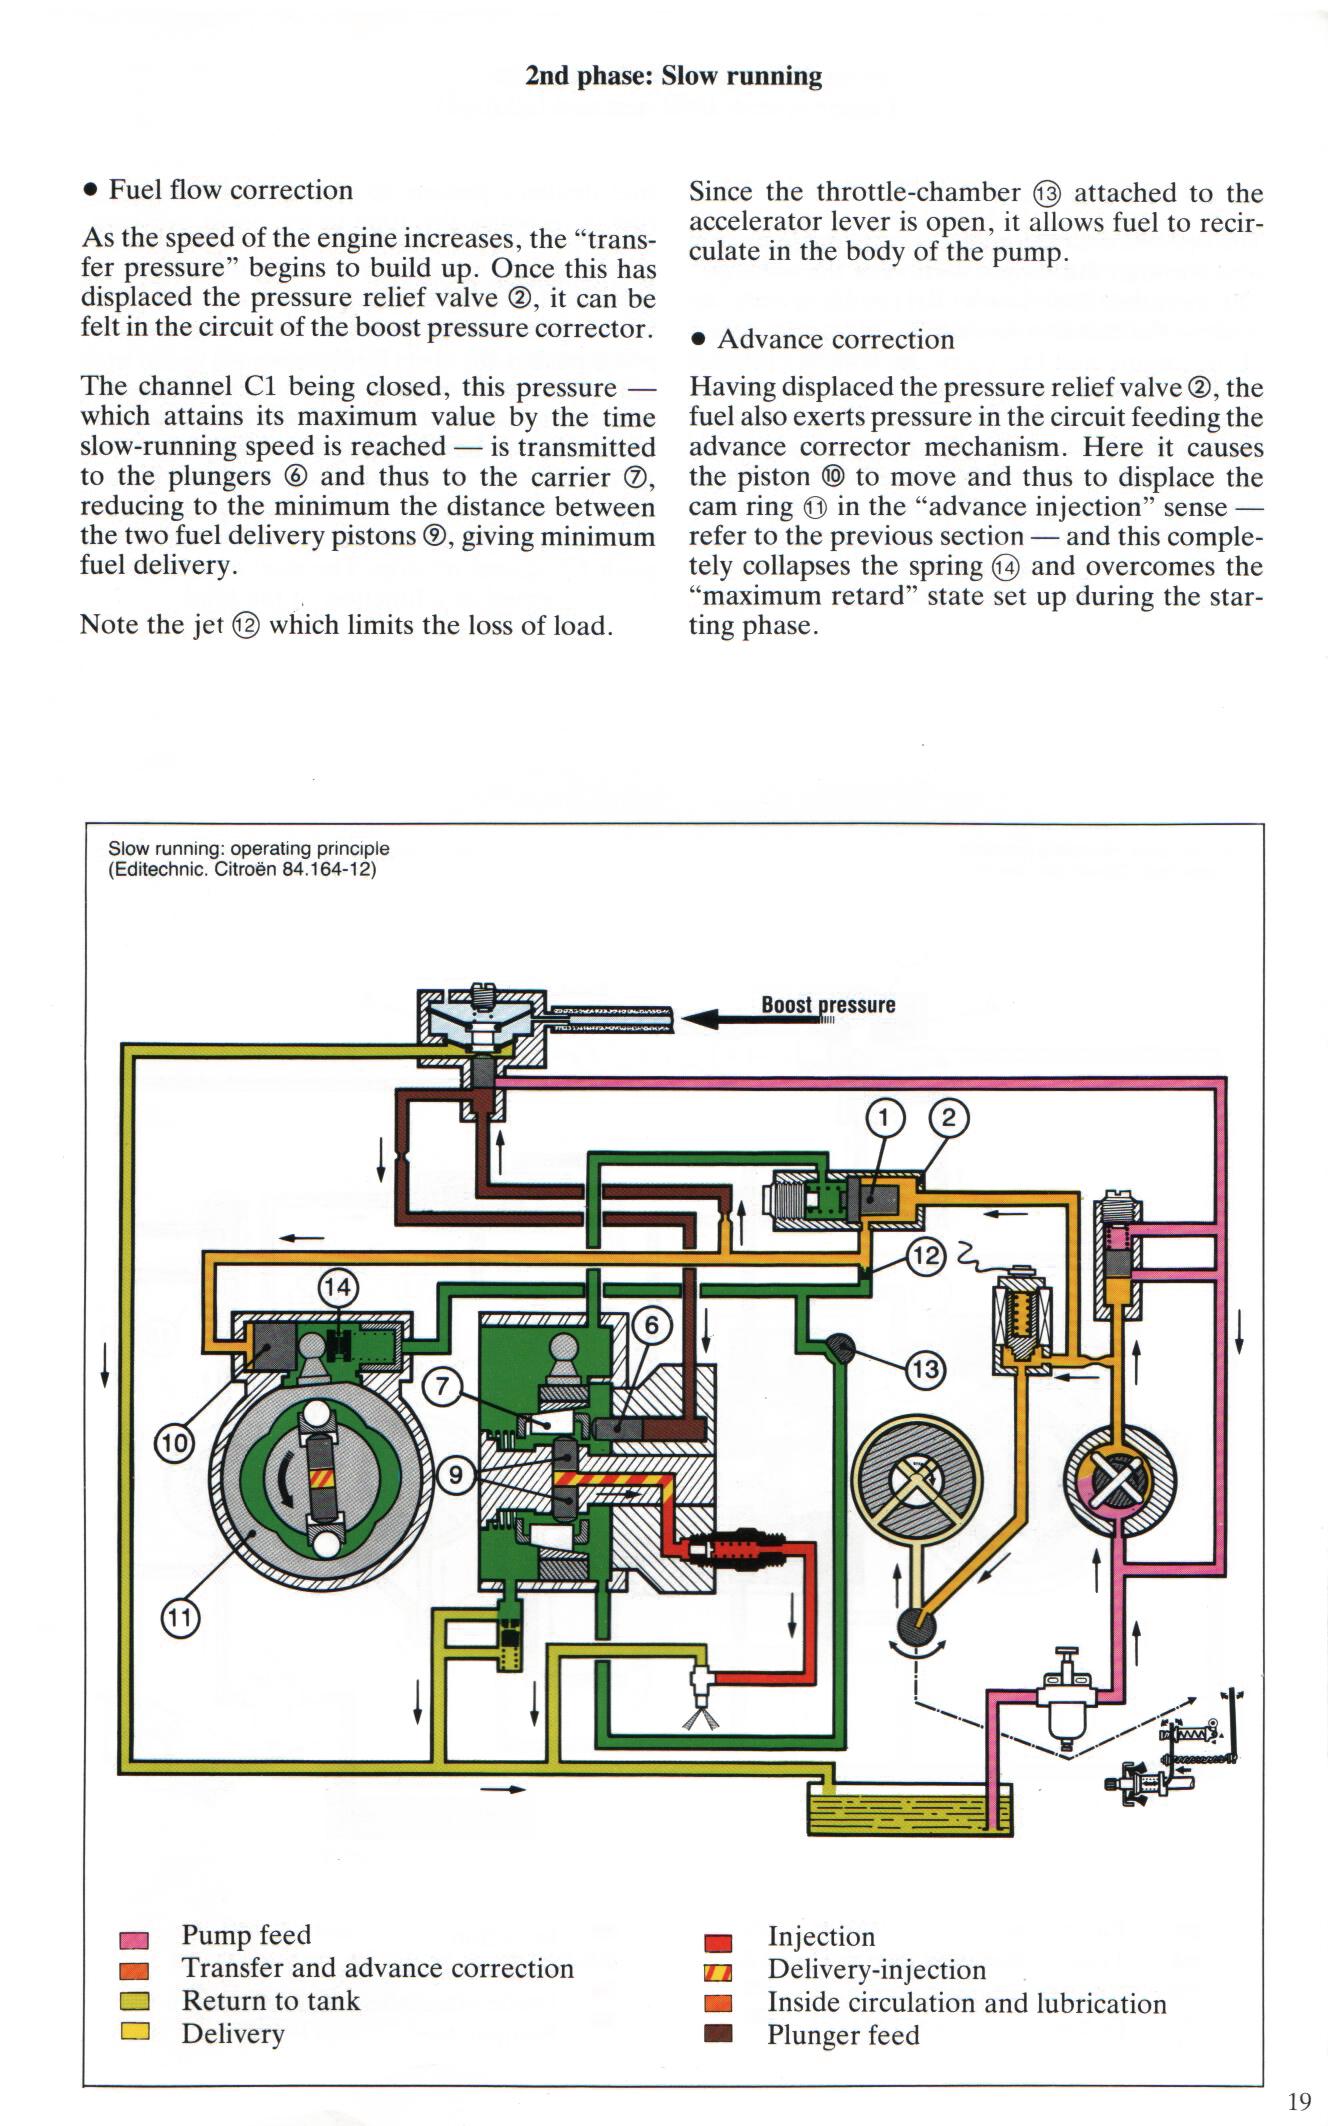 Index Of Passenger Cars Psa Cx 1984 Turbocharging Citroen Fuel Pressure Diagram